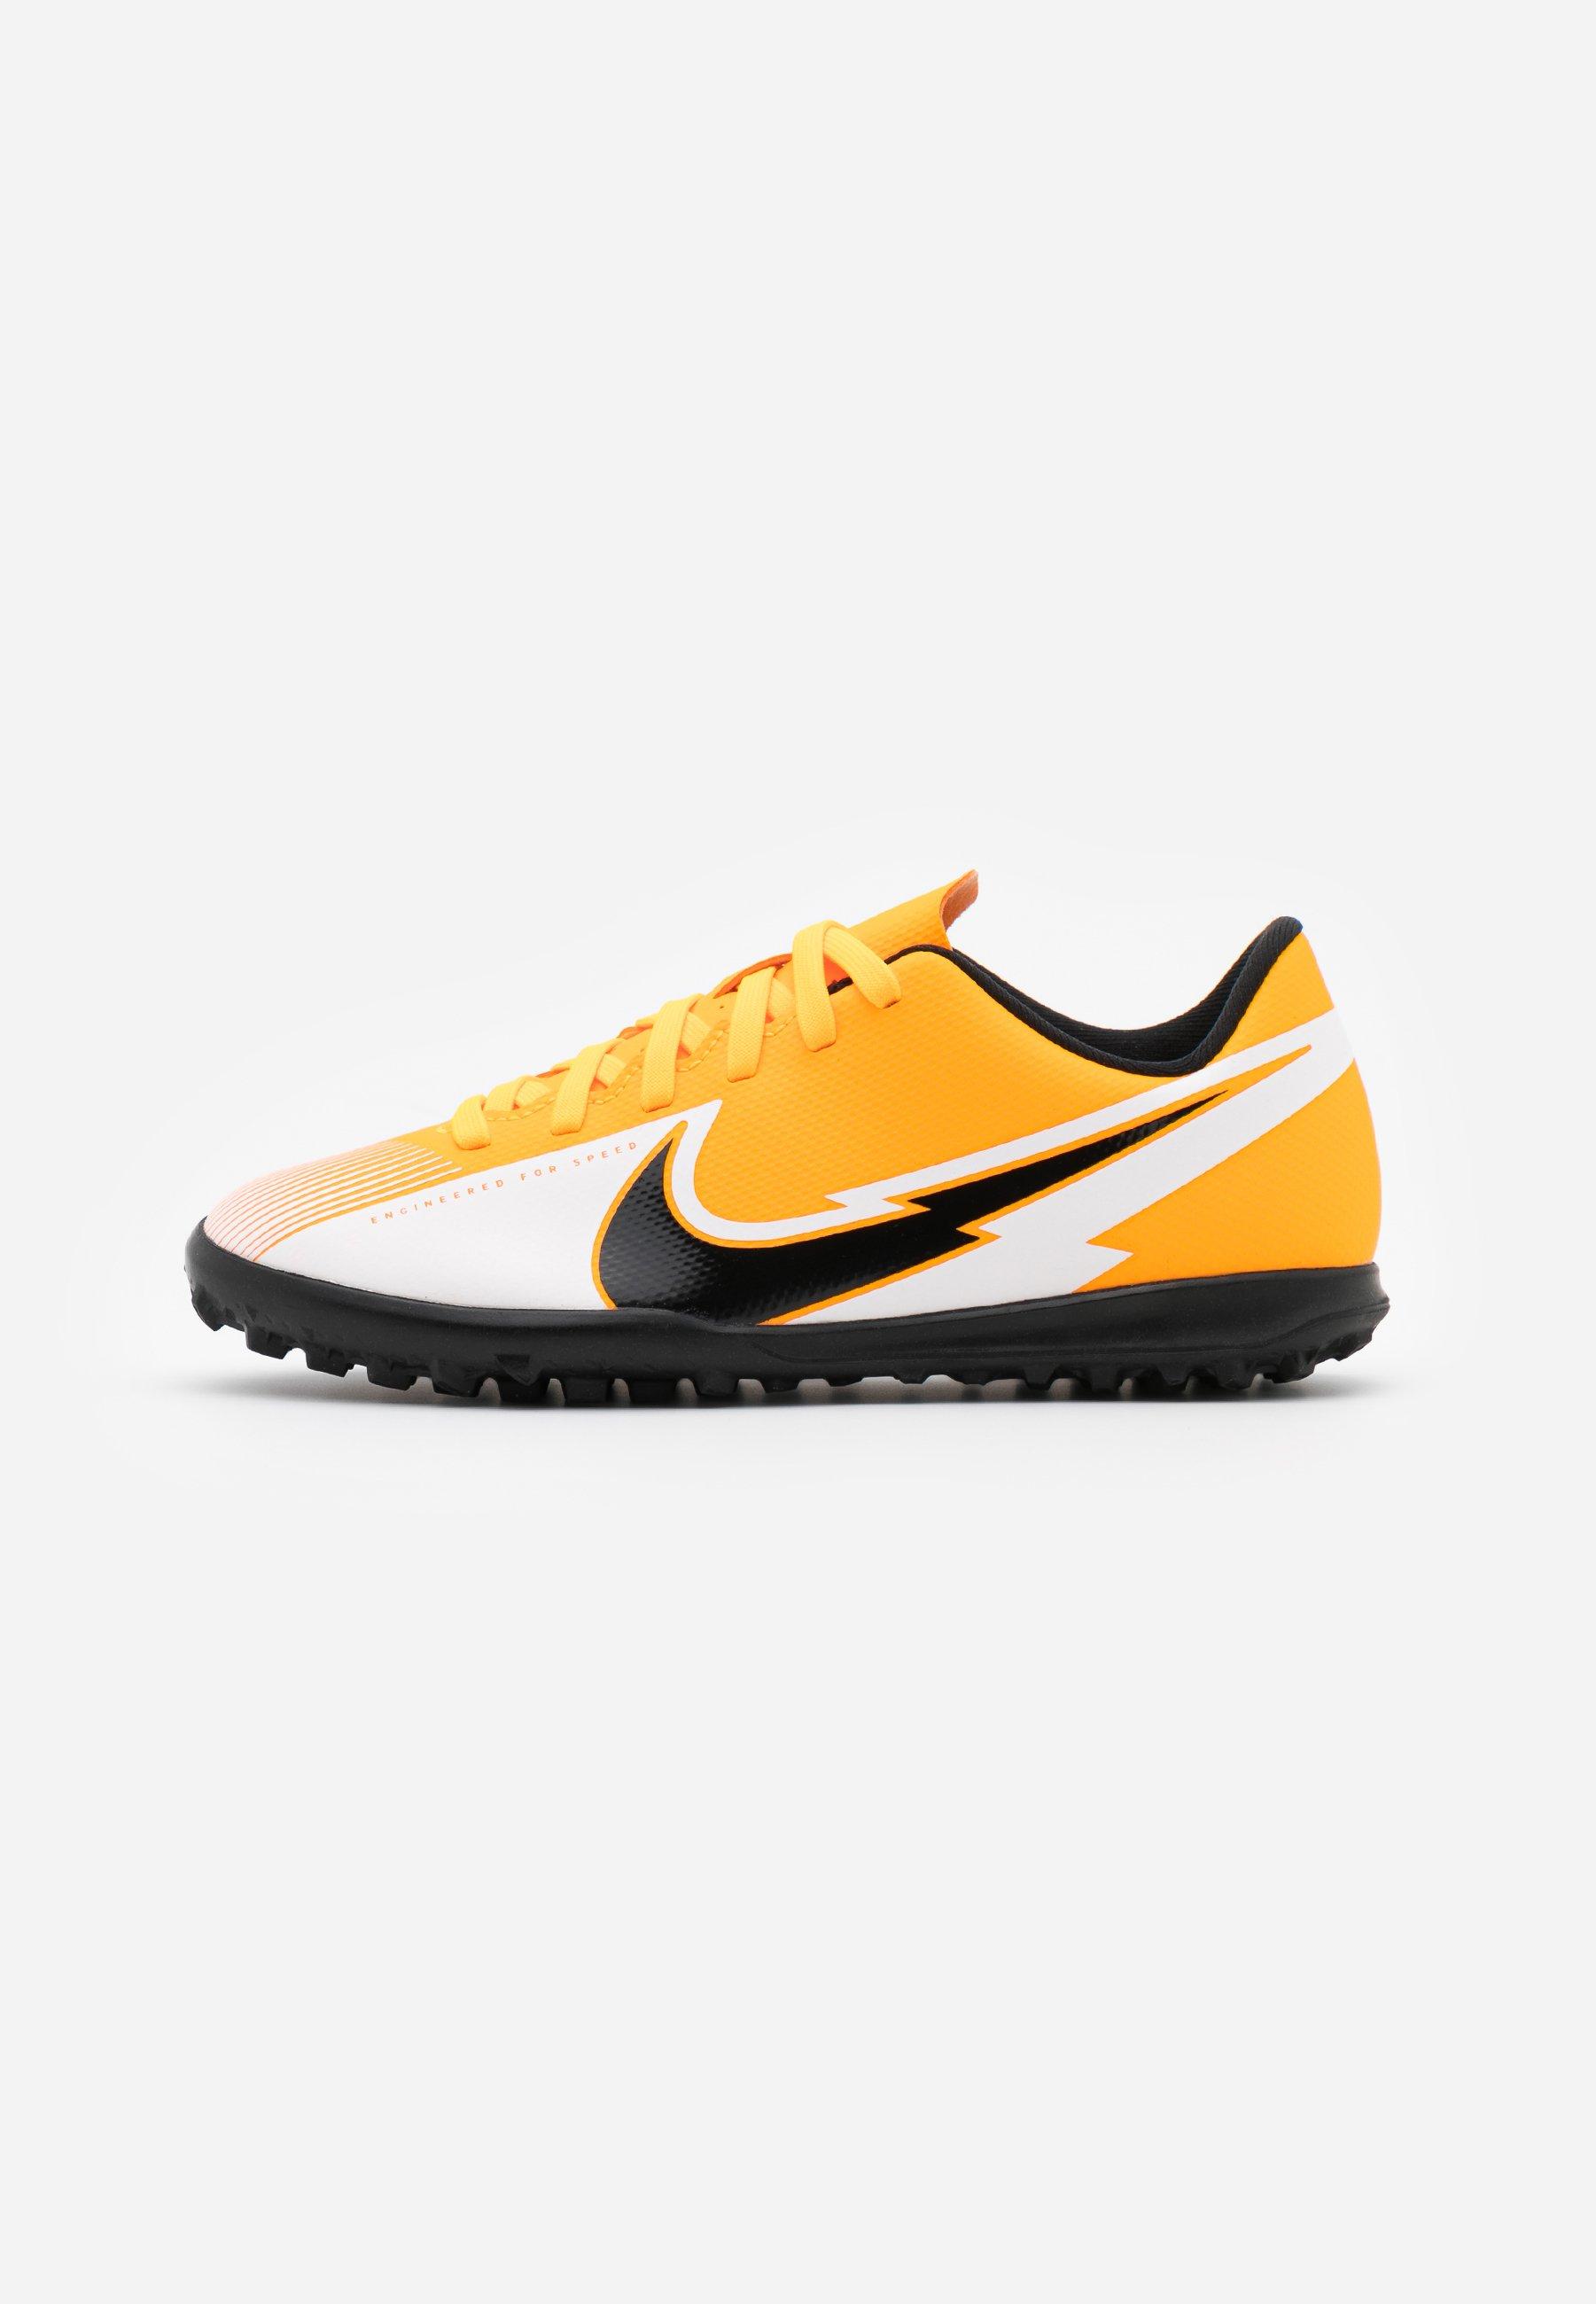 Enfatizar Hacer Montgomery  Nike Performance MERCURIAL VAPOR 13 CLUB TF - Astro turf trainers - laser  orange/black/white/orange - Zalando.co.uk